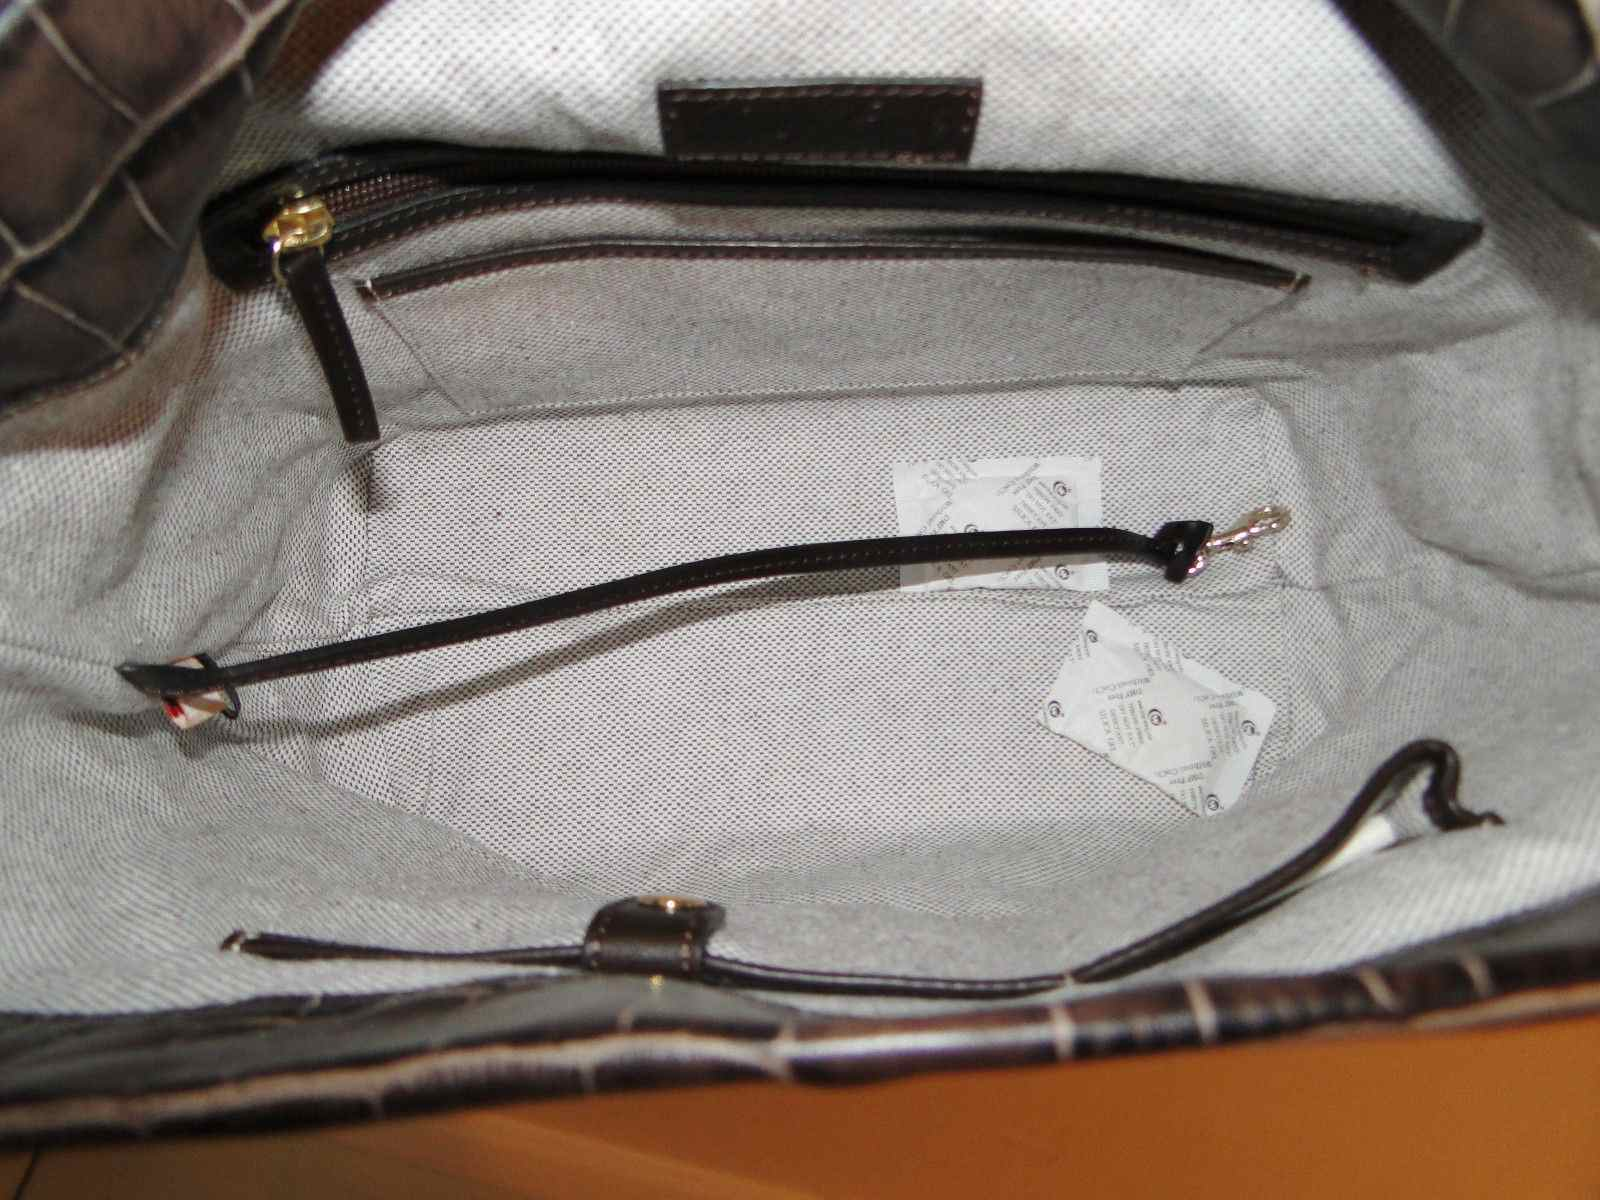 Dooney & Bourke Logo Lock Leather Sac & Accessories *MINOR DEFECT*